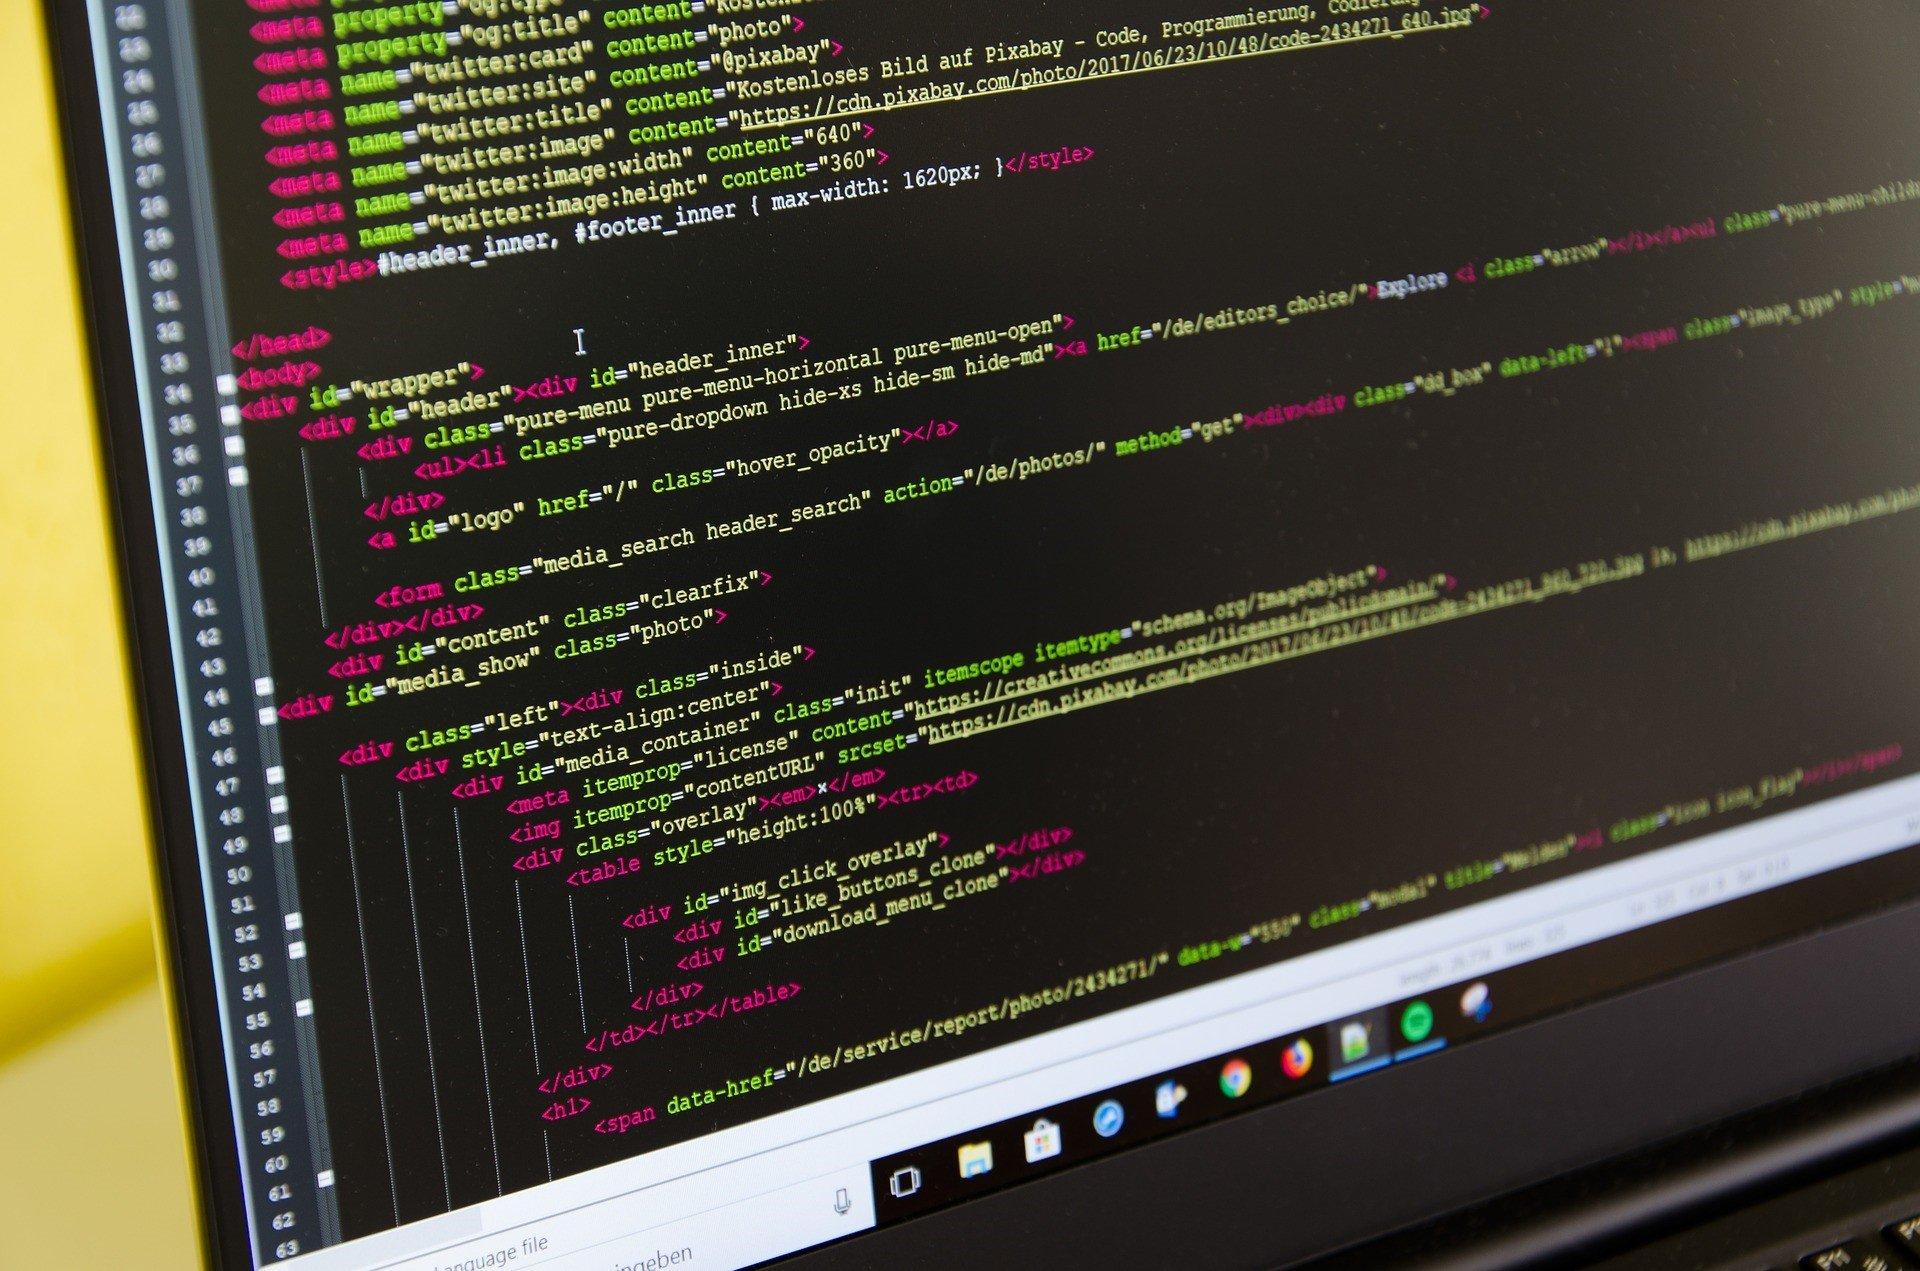 Software Development in 2 Minutes